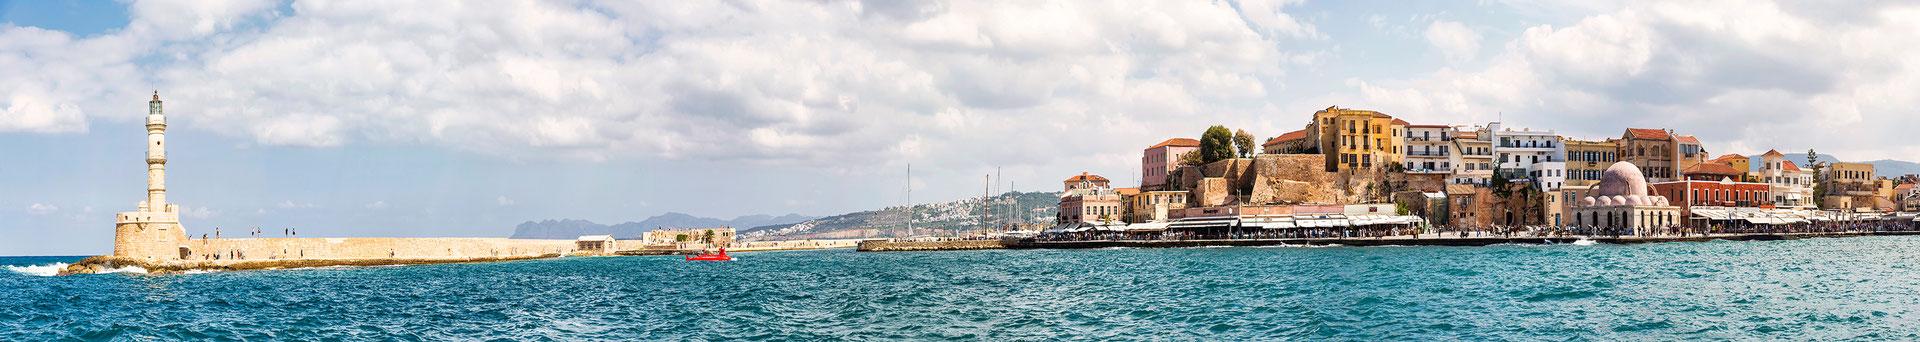 Chania / Kreta / Griechenland